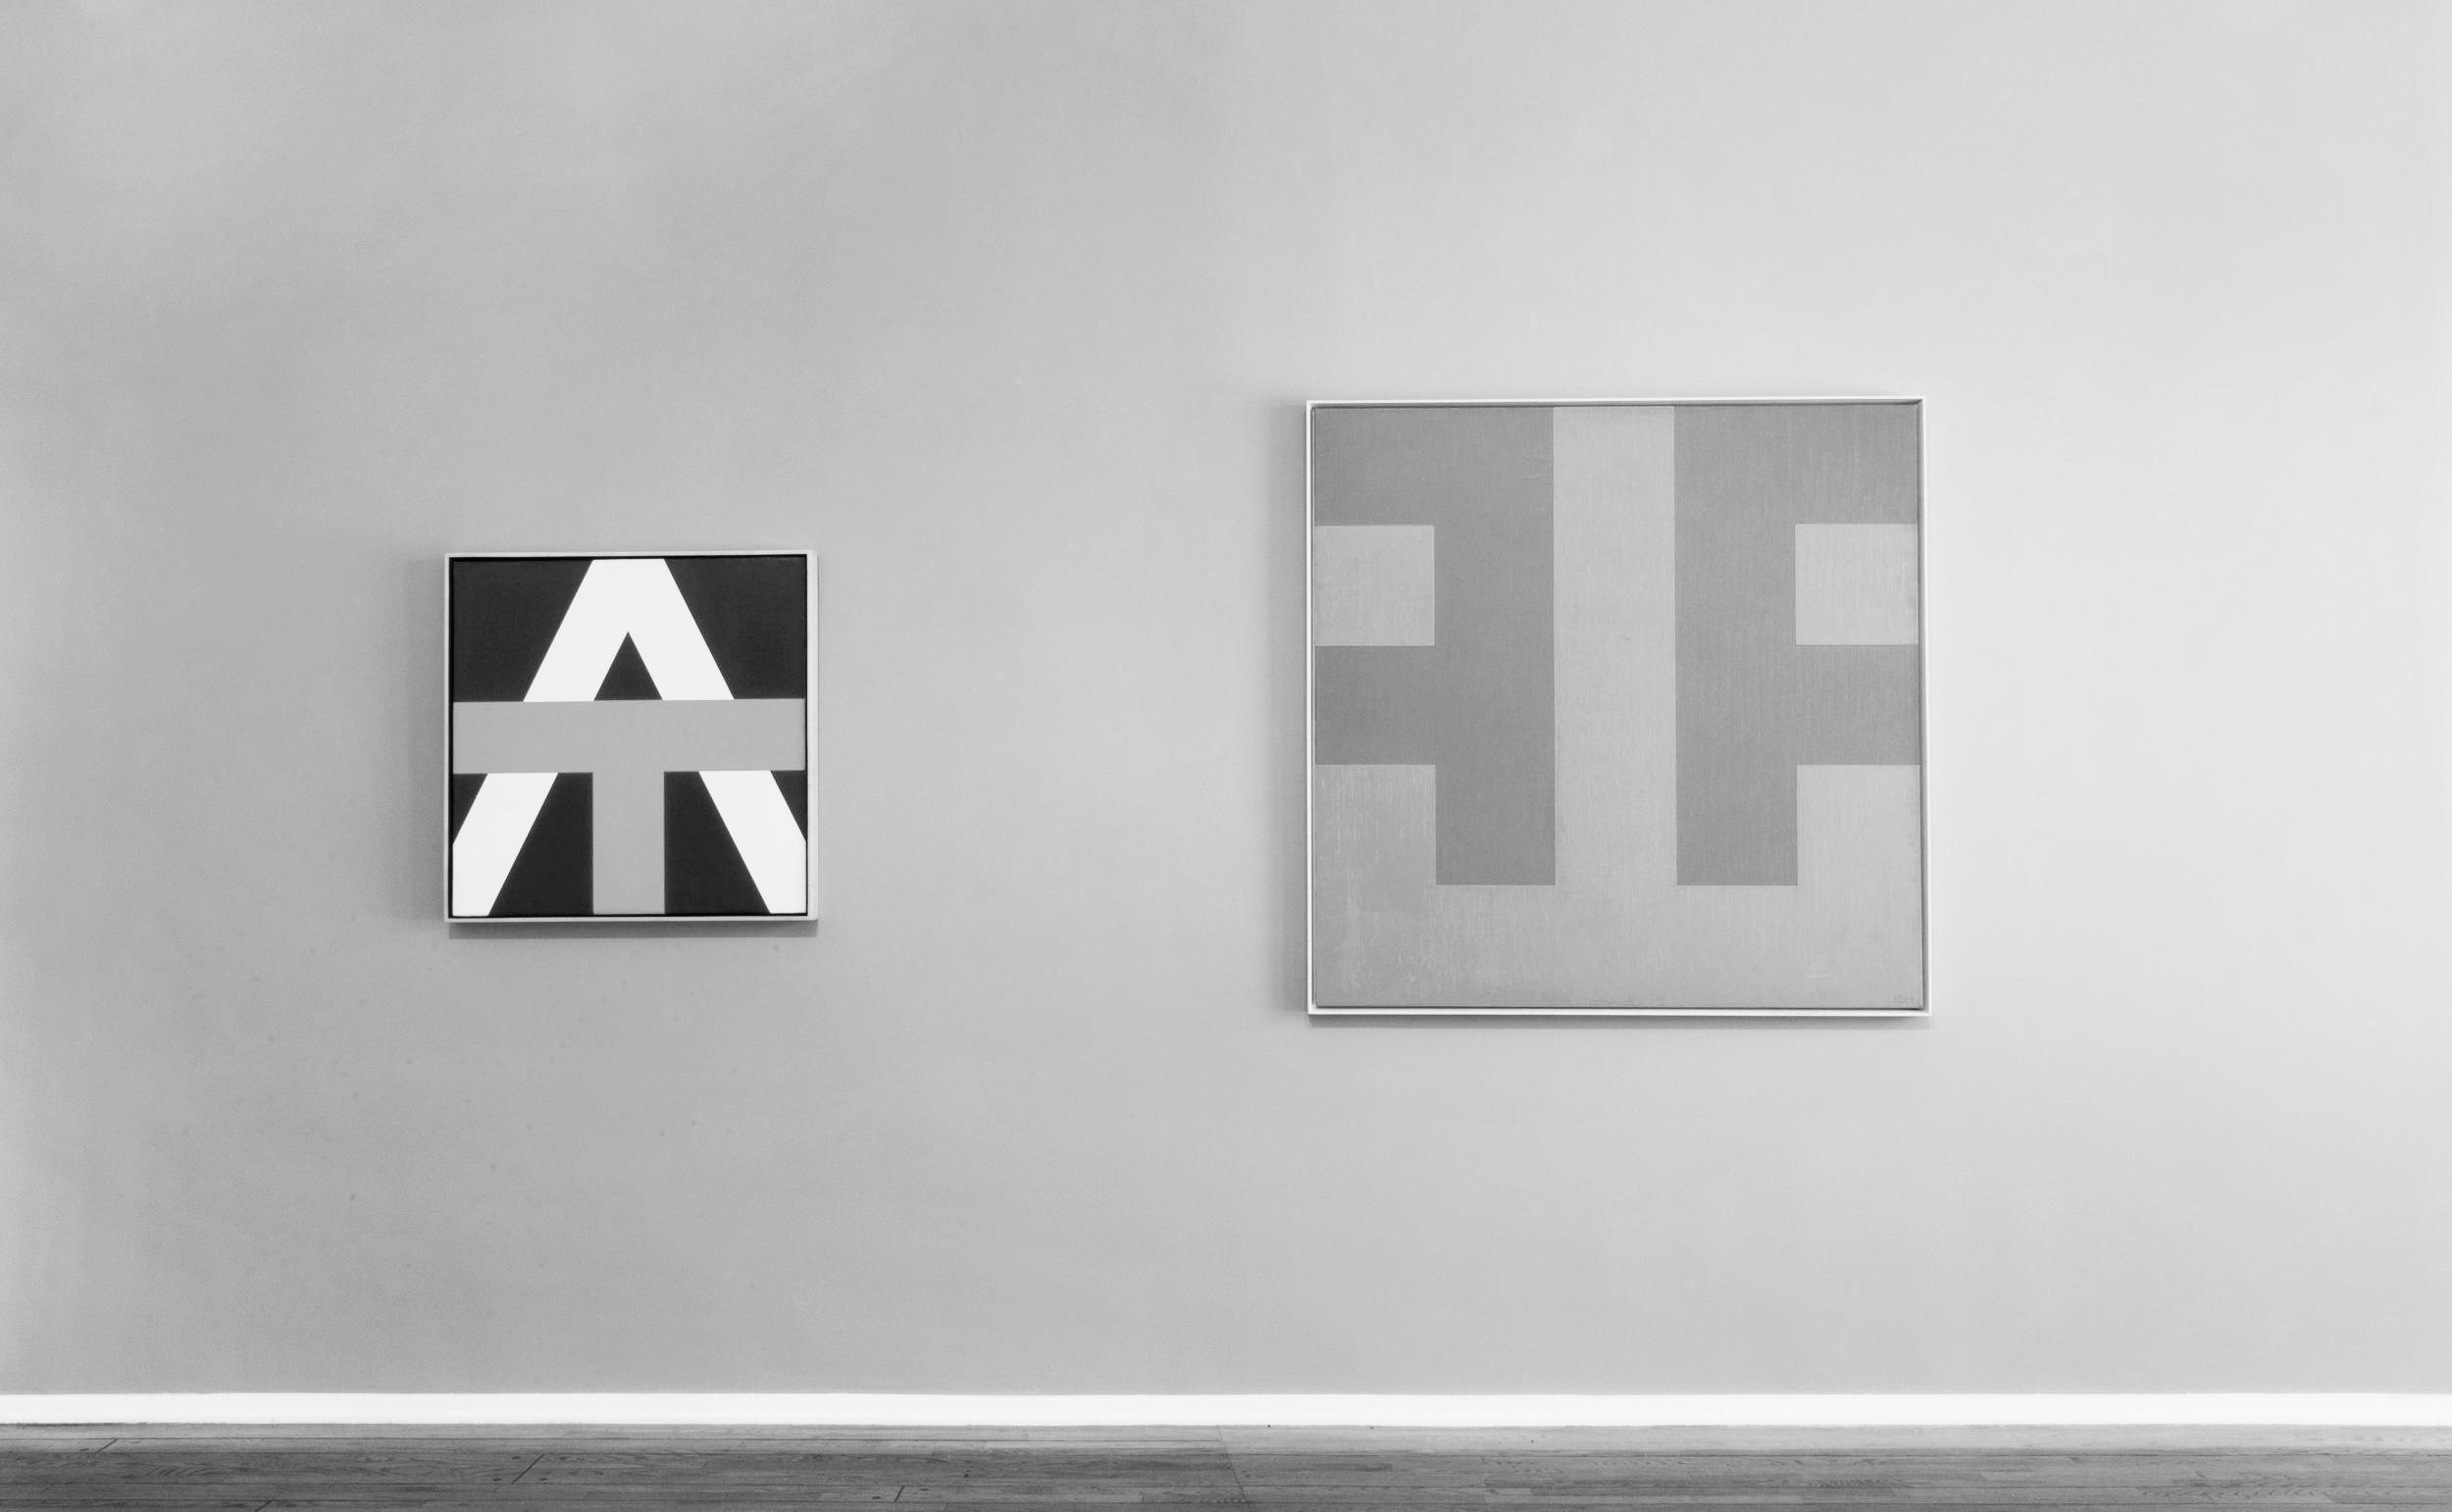 The Alphabet, Art Exhibit // photo source: Louis Stern Fine Arts